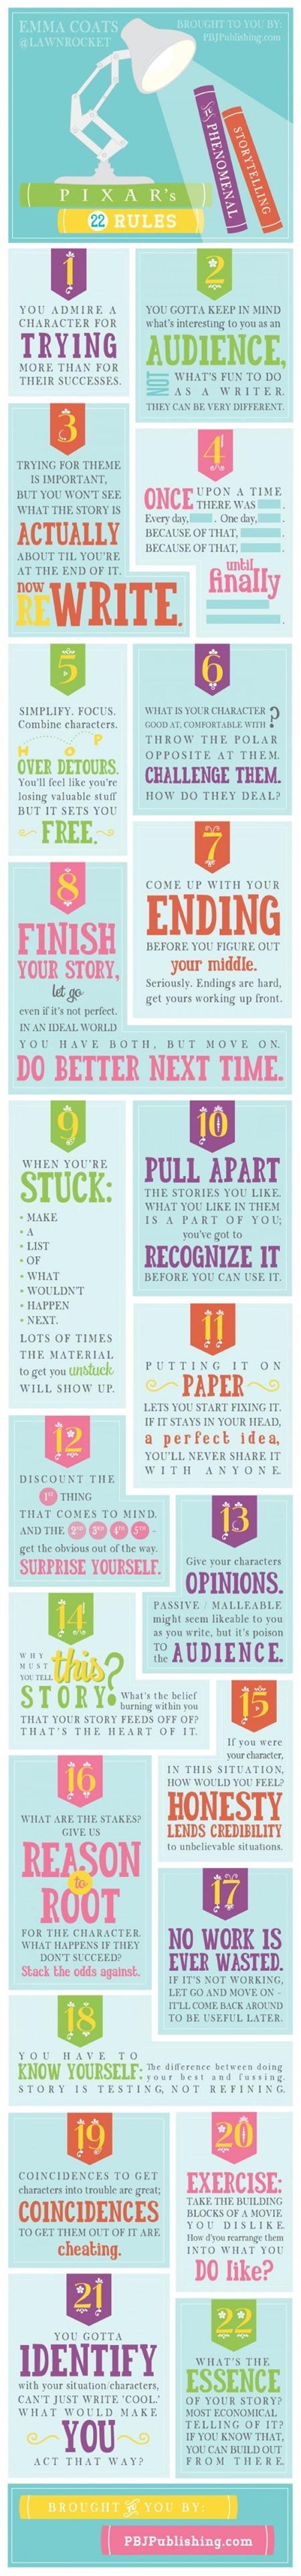 Pixar -story-telling rules